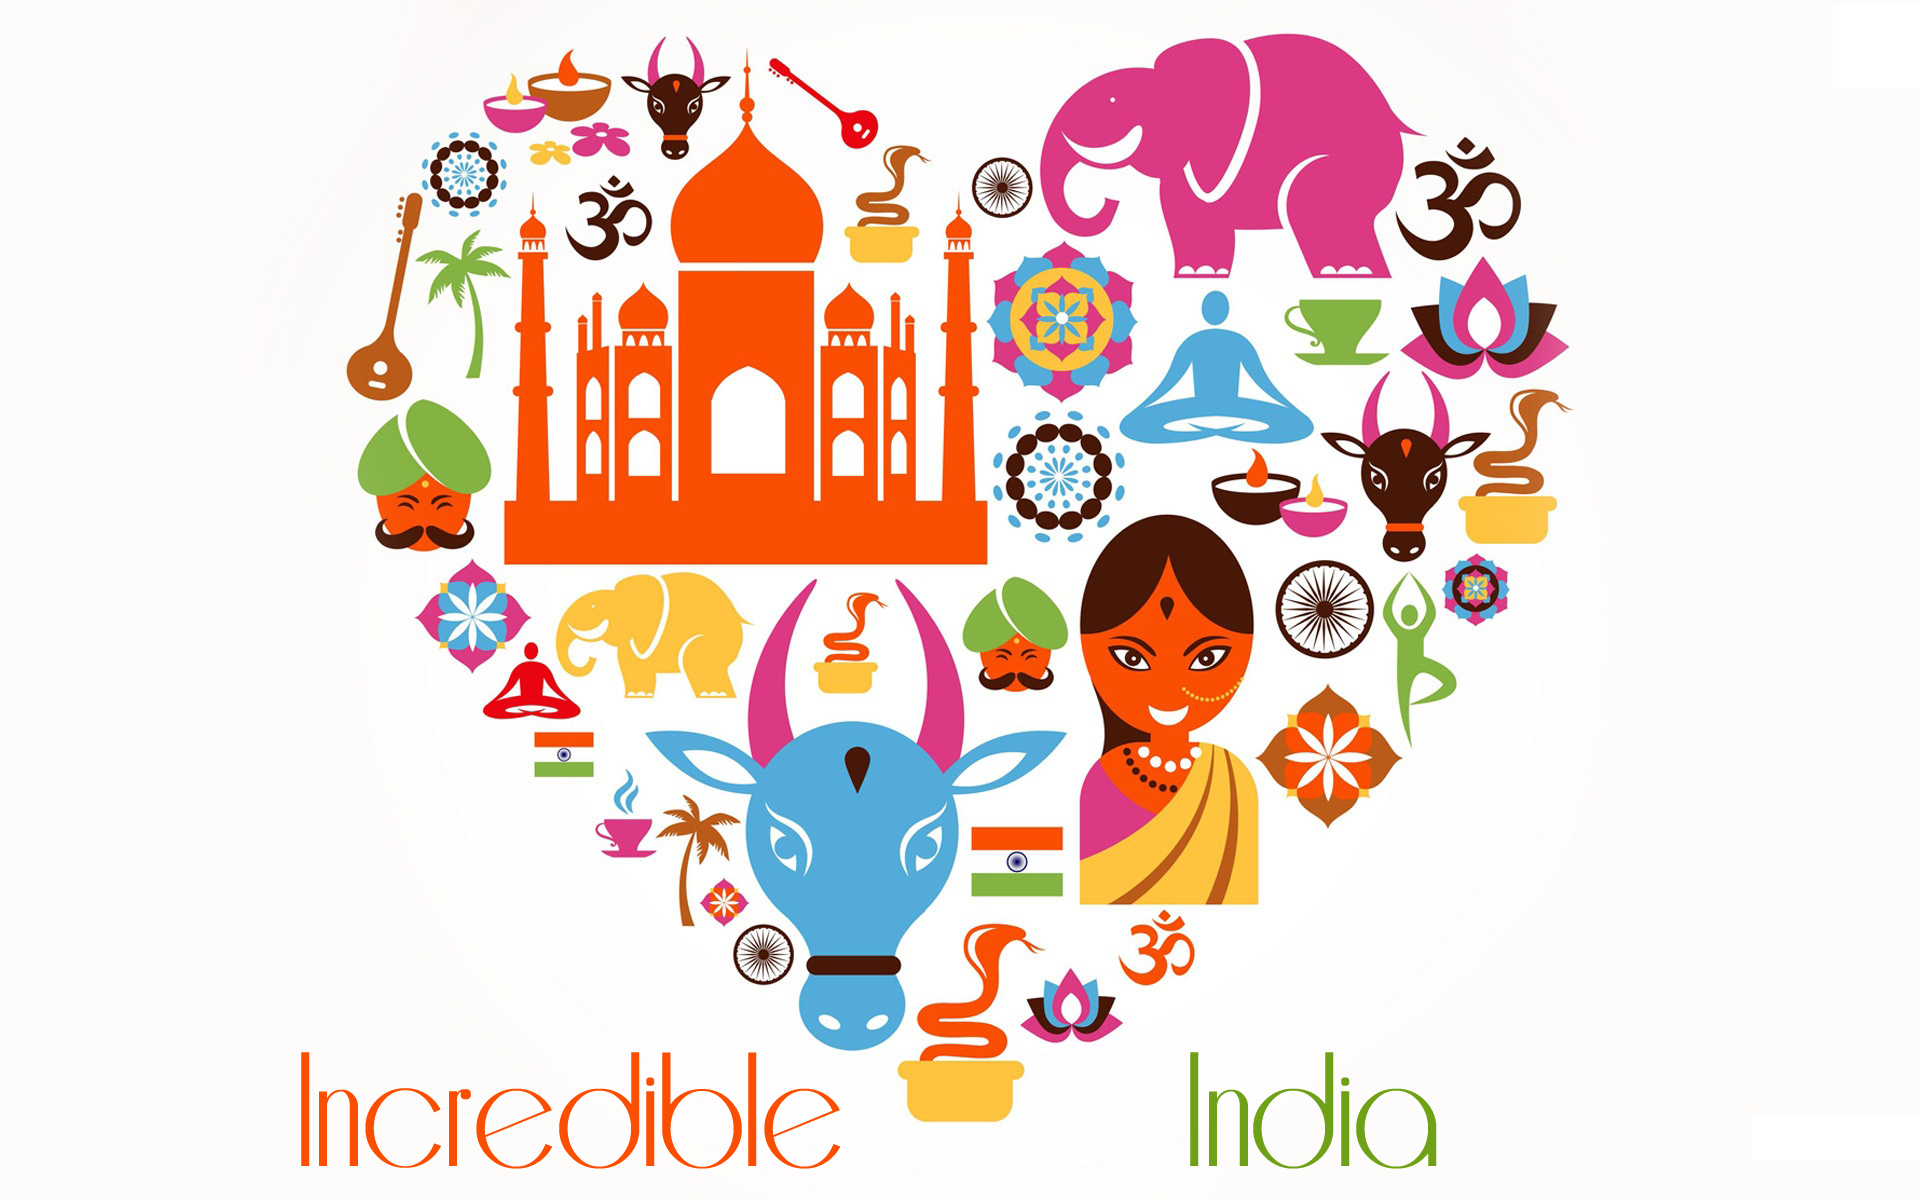 Incredible India [photo credit google images] 1920x1200